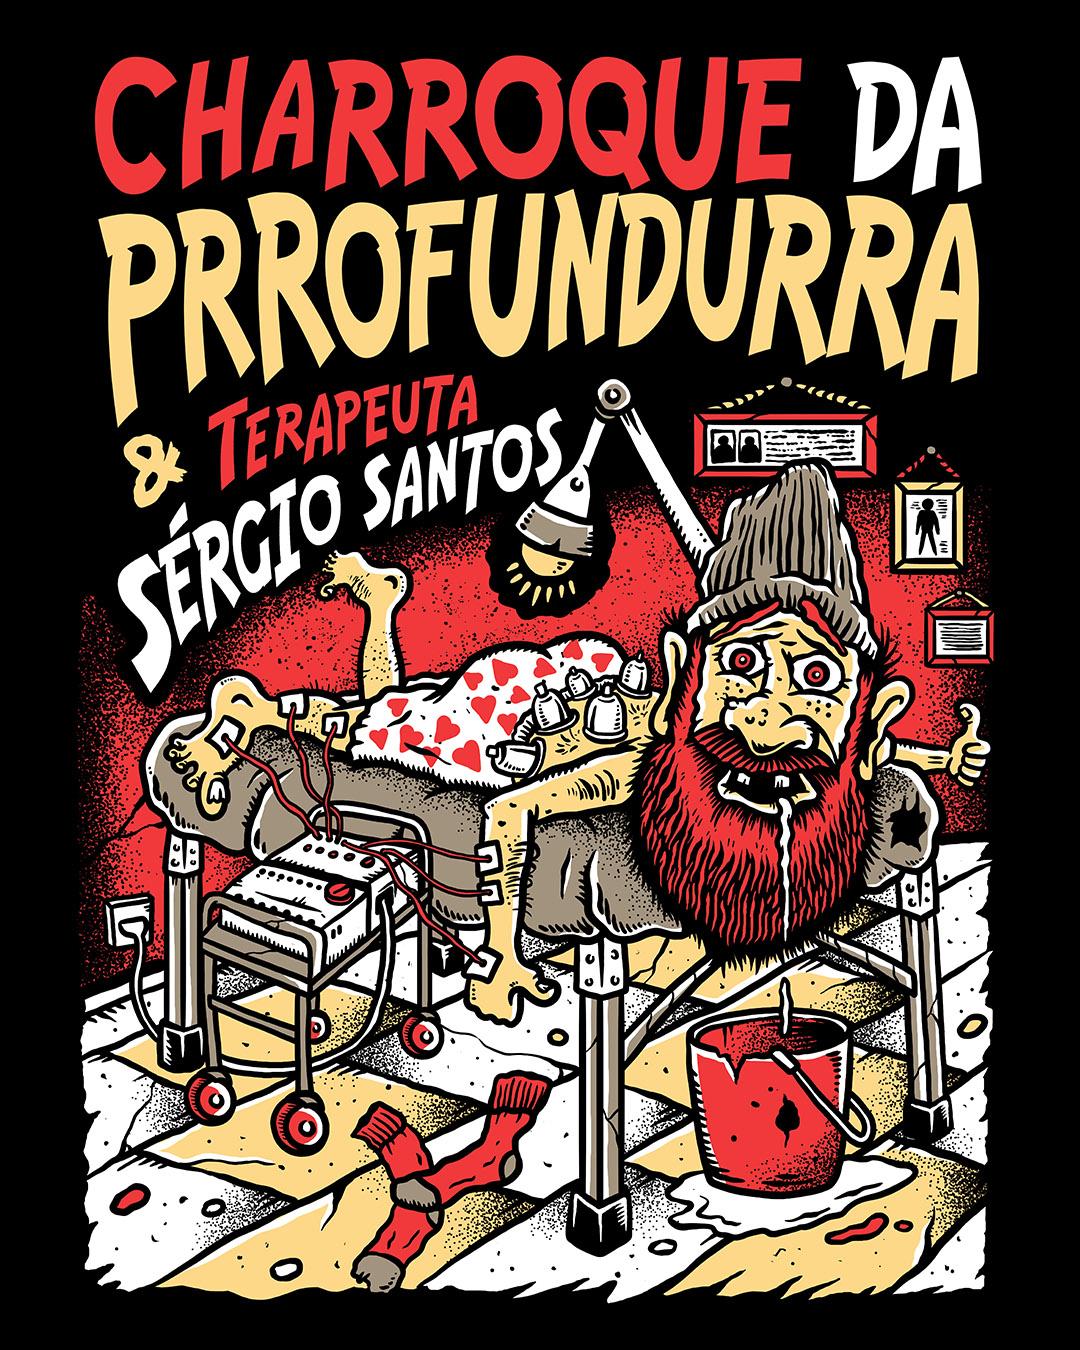 Terapeuta Sérgio Santos